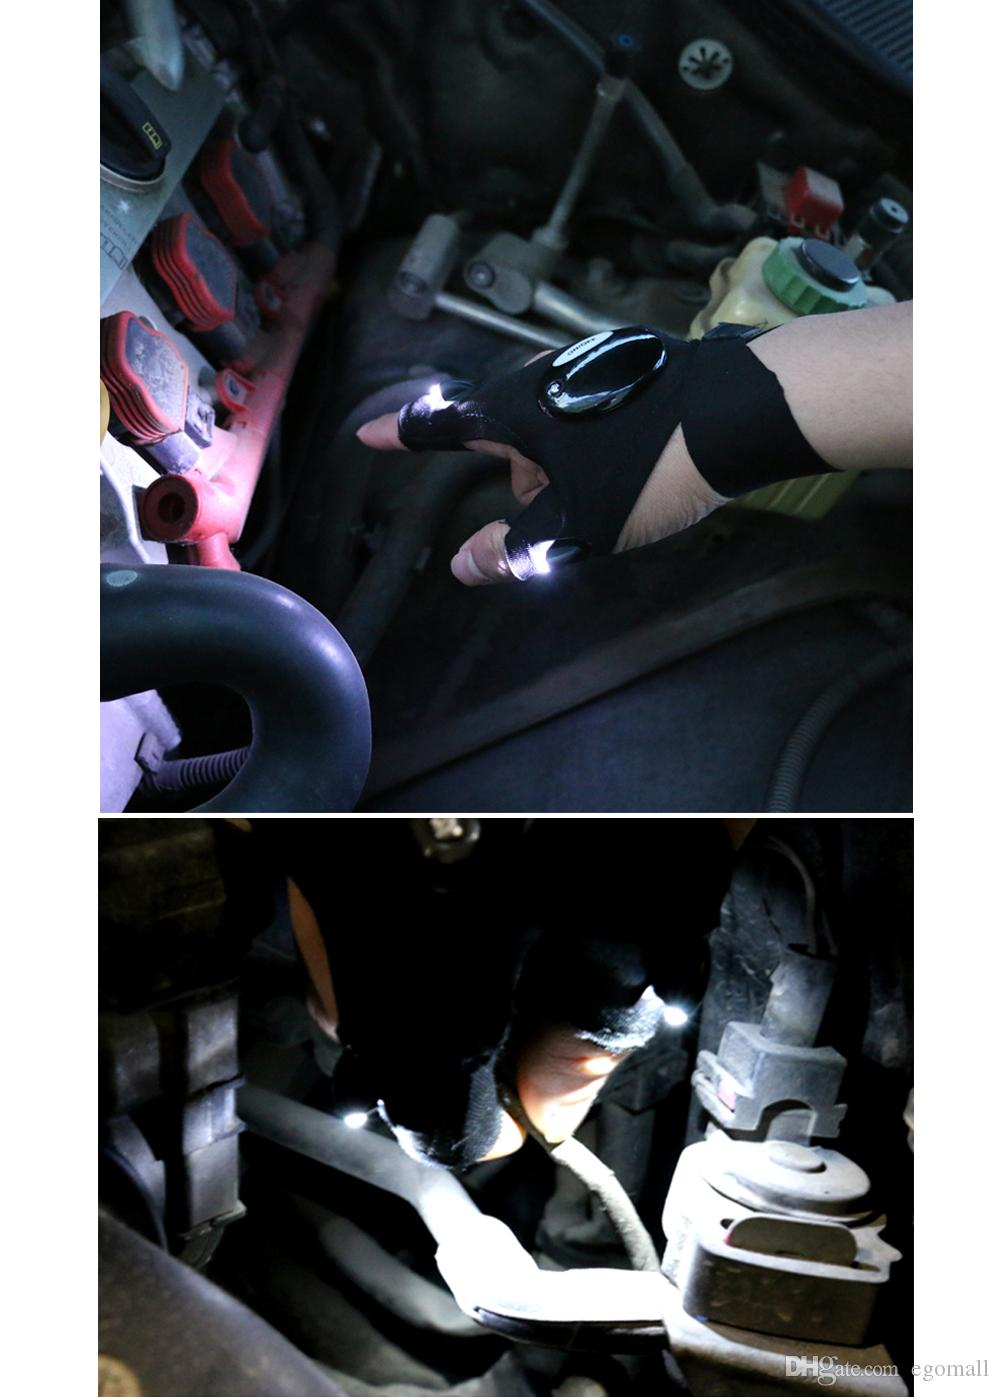 Lighting glove Night car repair glove led light Night fishing lamp glove hanging bait lamp night fishing supplies